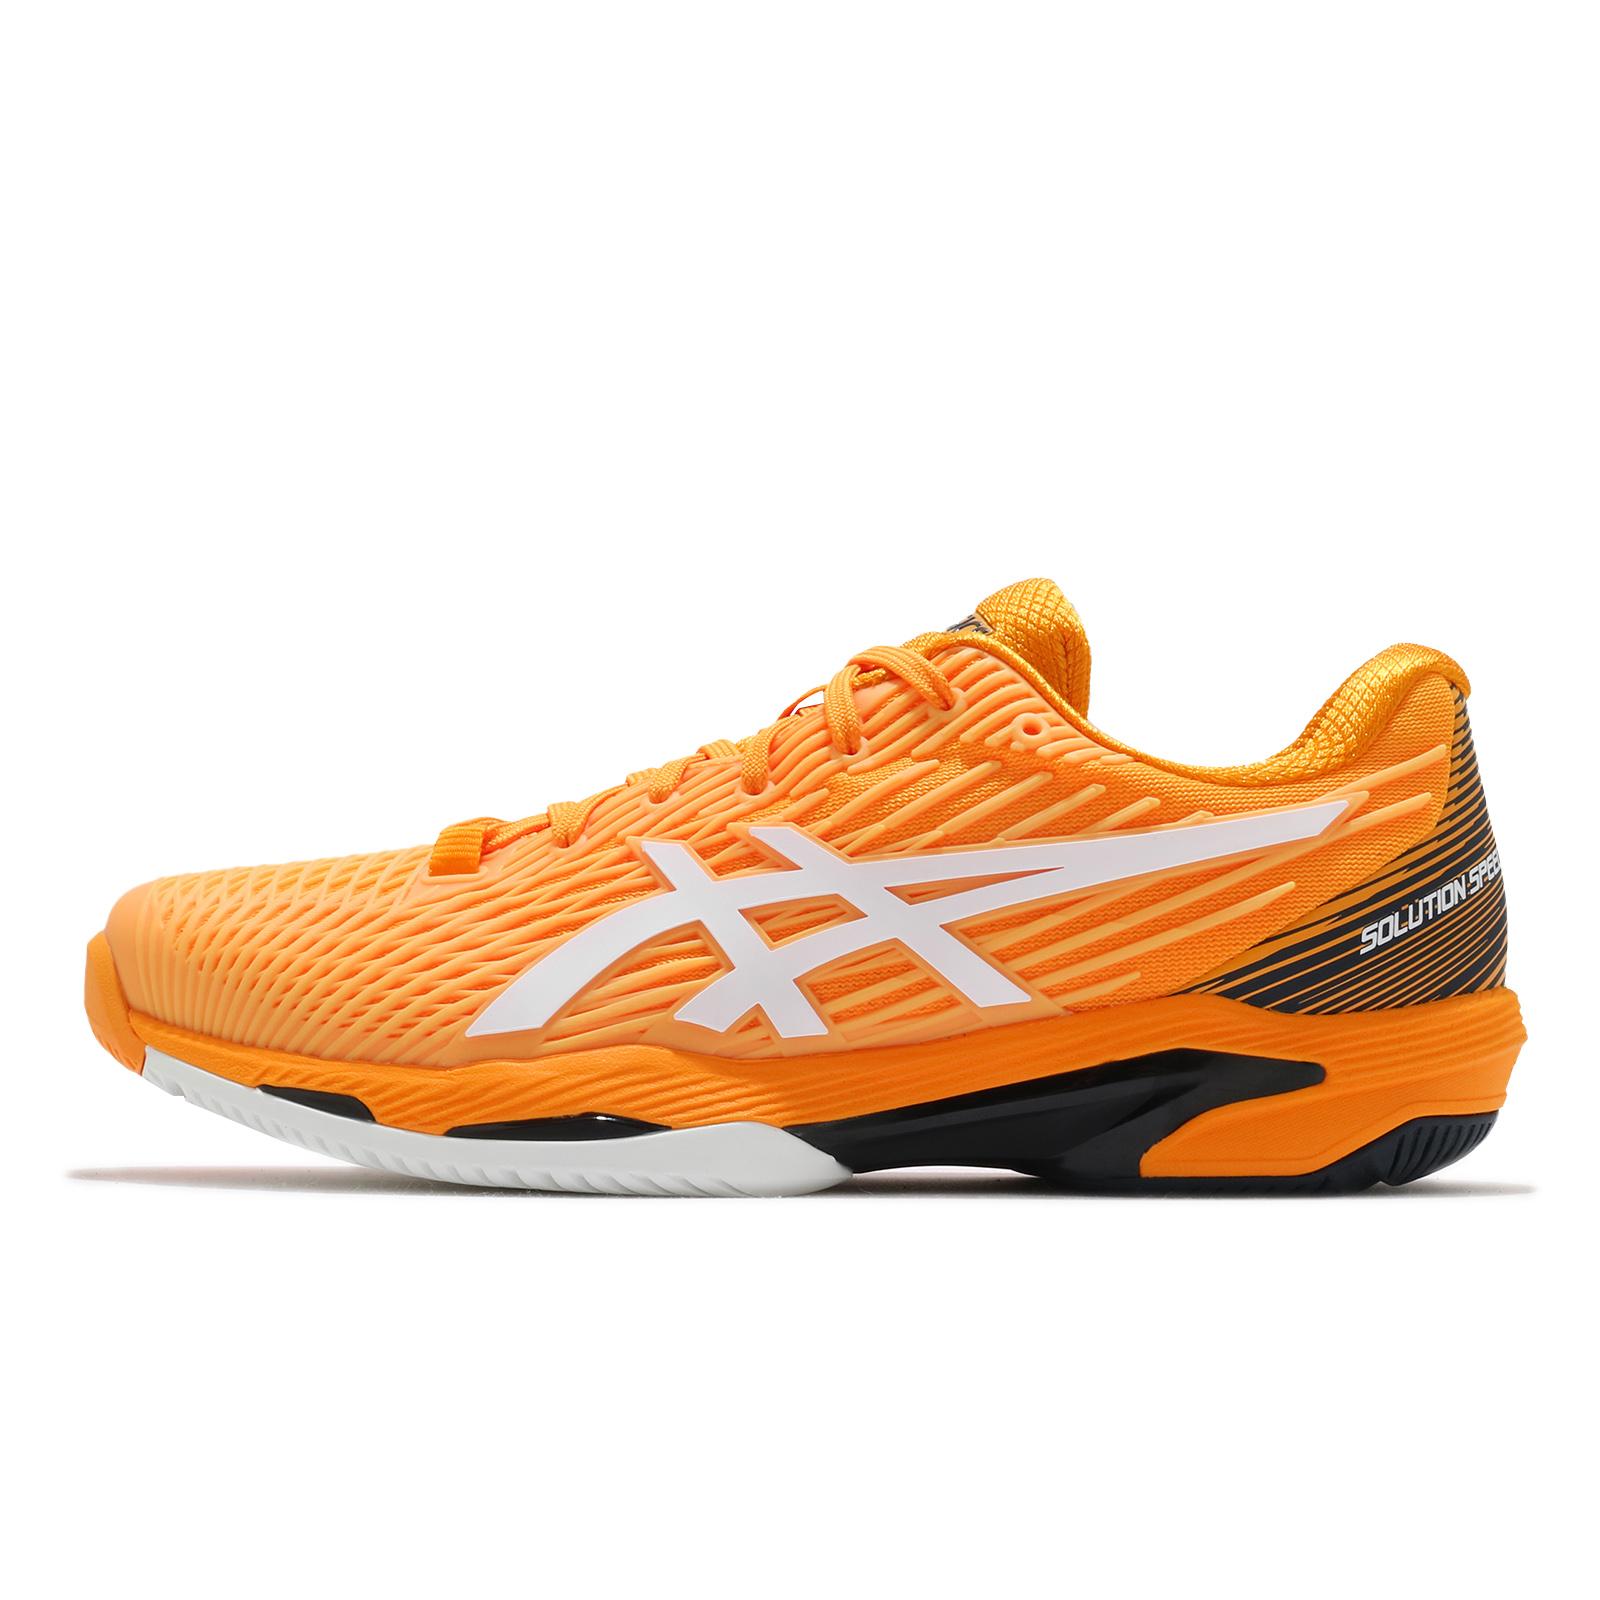 Asics 網球鞋 Solution Speed FF 2 男 黃 速度型 代言款 【ACS】 1041A182-800